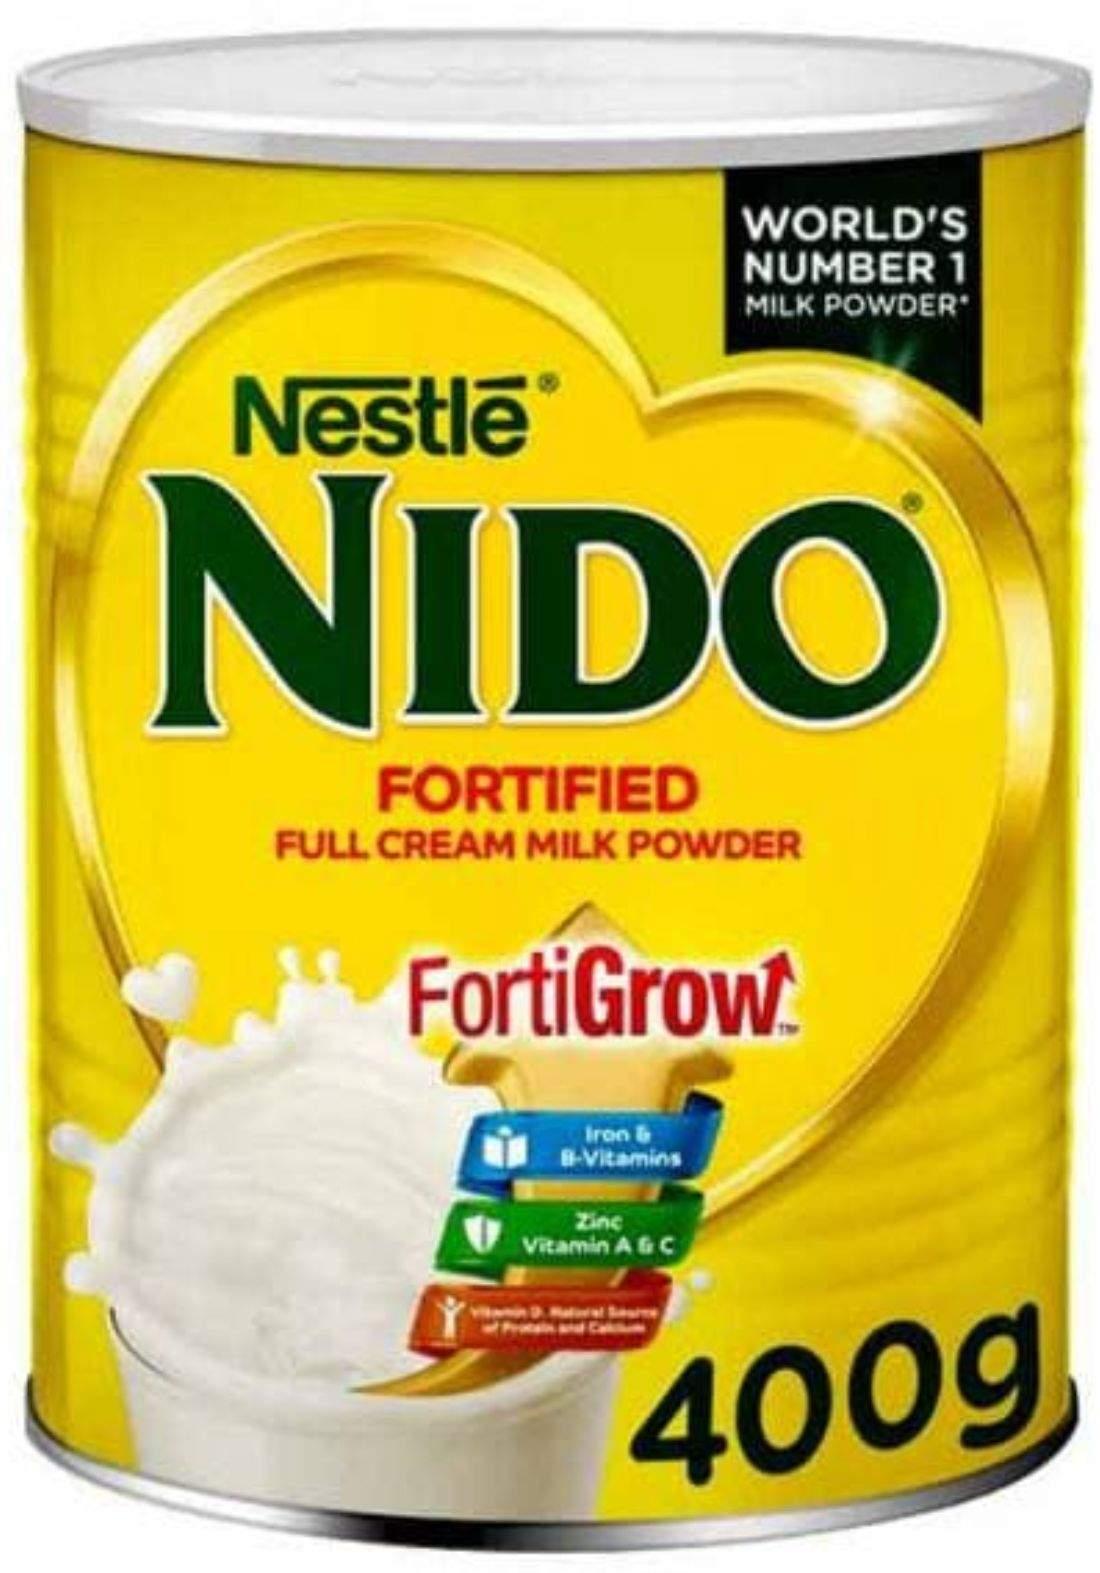 Nido milk powder 400g نيدو حليب باودر